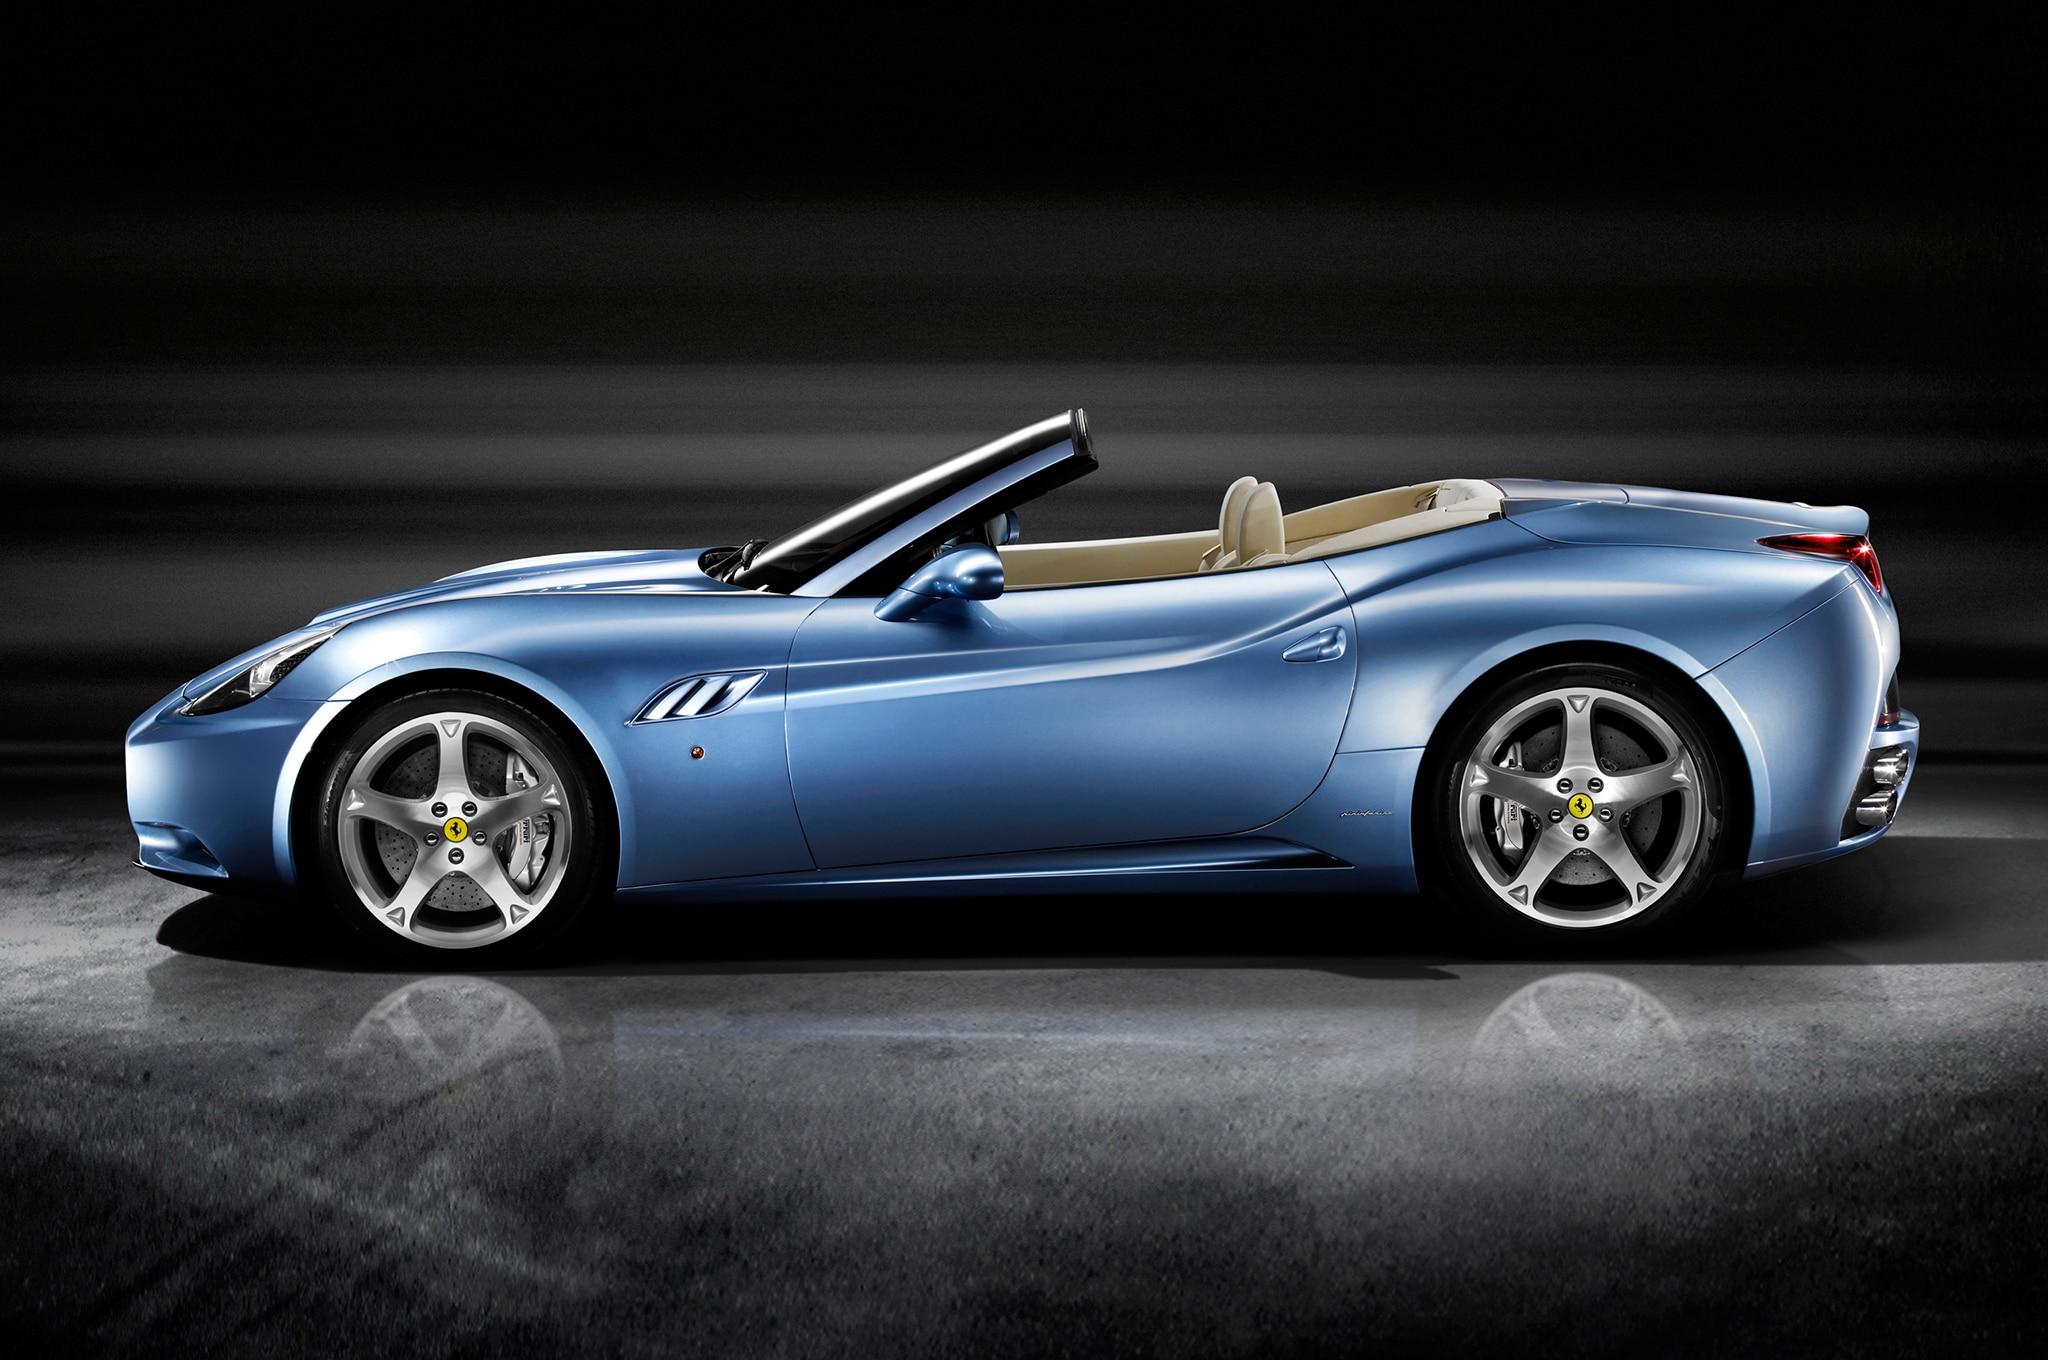 2018 Ferrari Portofino Waves Goodbye to California | Automobile Magazine